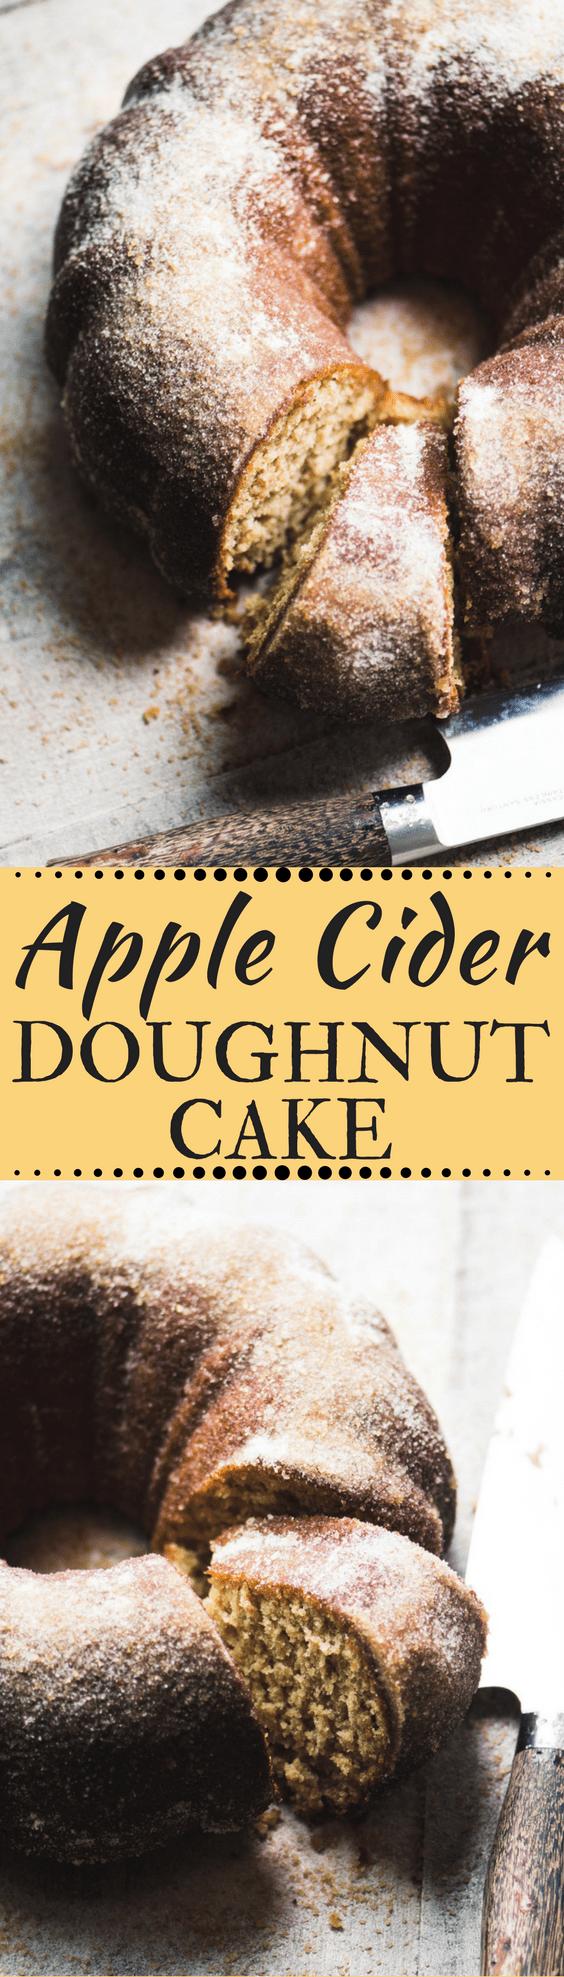 Apple Cider Doughnut Cake ~ a warm cinnamon apple bundt cake that tastes just like the iconic apple cider doughnuts you love. #cake #ciderdoughnuts #poundcake #bundtcake #cidercake #applecake #bestapplecake #dessert #fallrecipe #recipe #fall #apples #bestbundtcake #easy #coffeecake #brunch